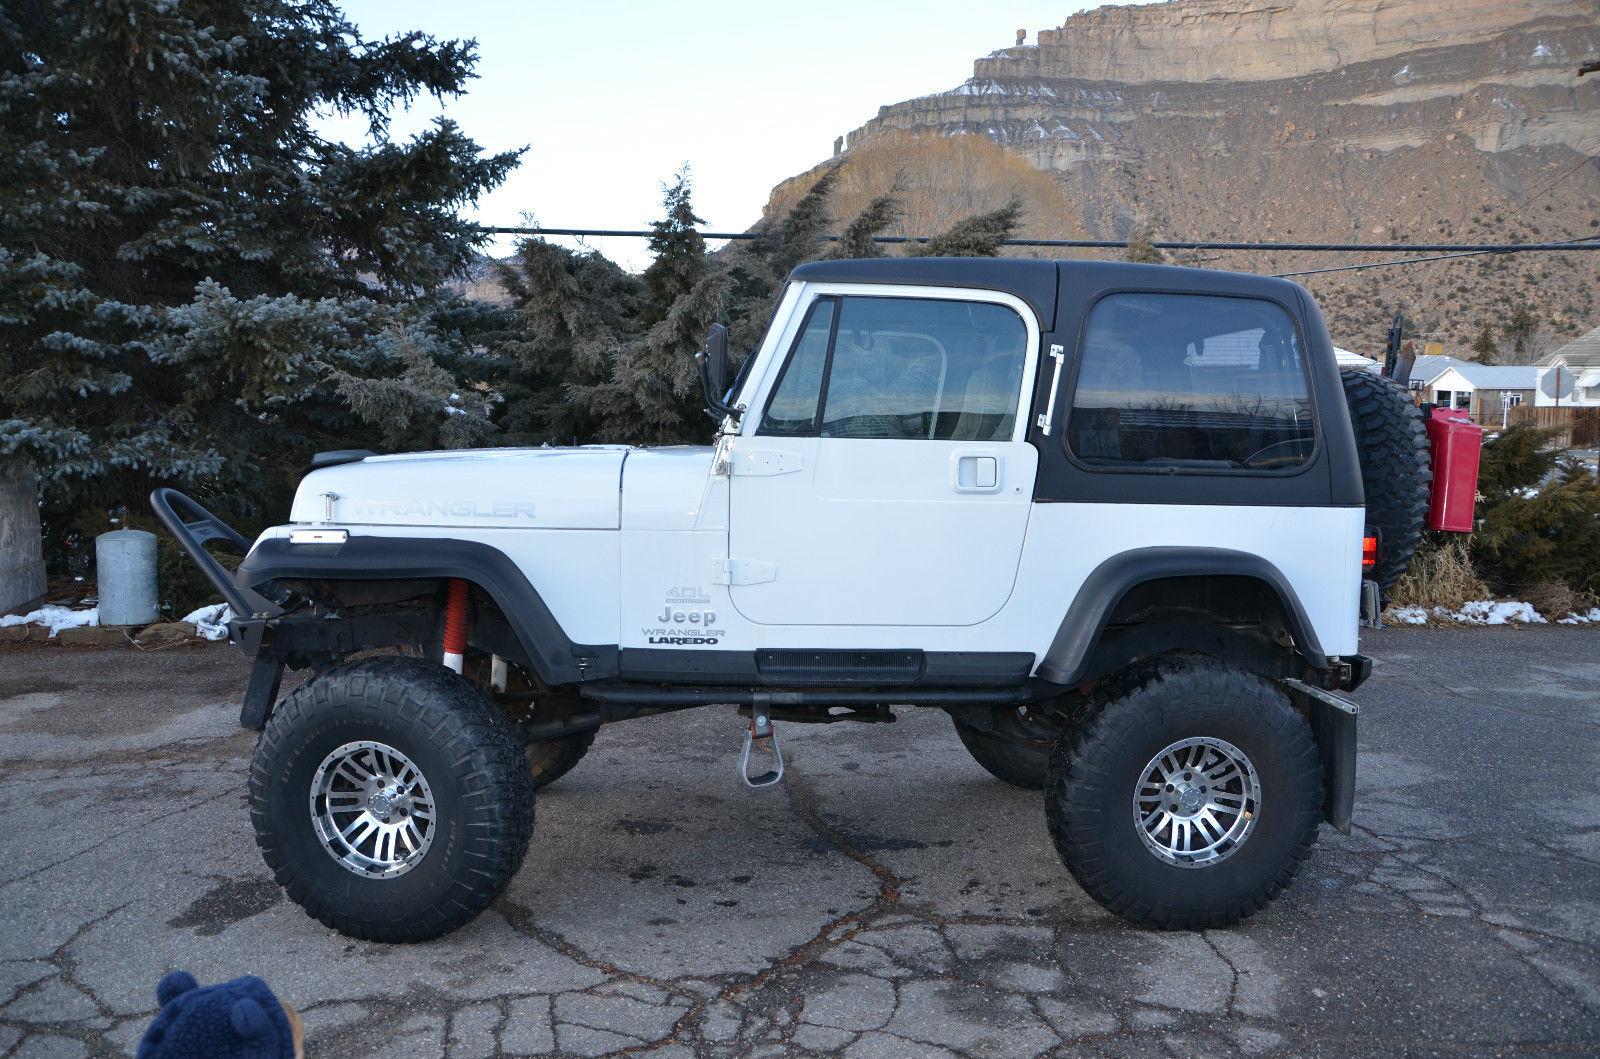 1994 Jeep Wrangler Se Rock Crawler For Sale In Helper  Utah  United States For Sale  Photos